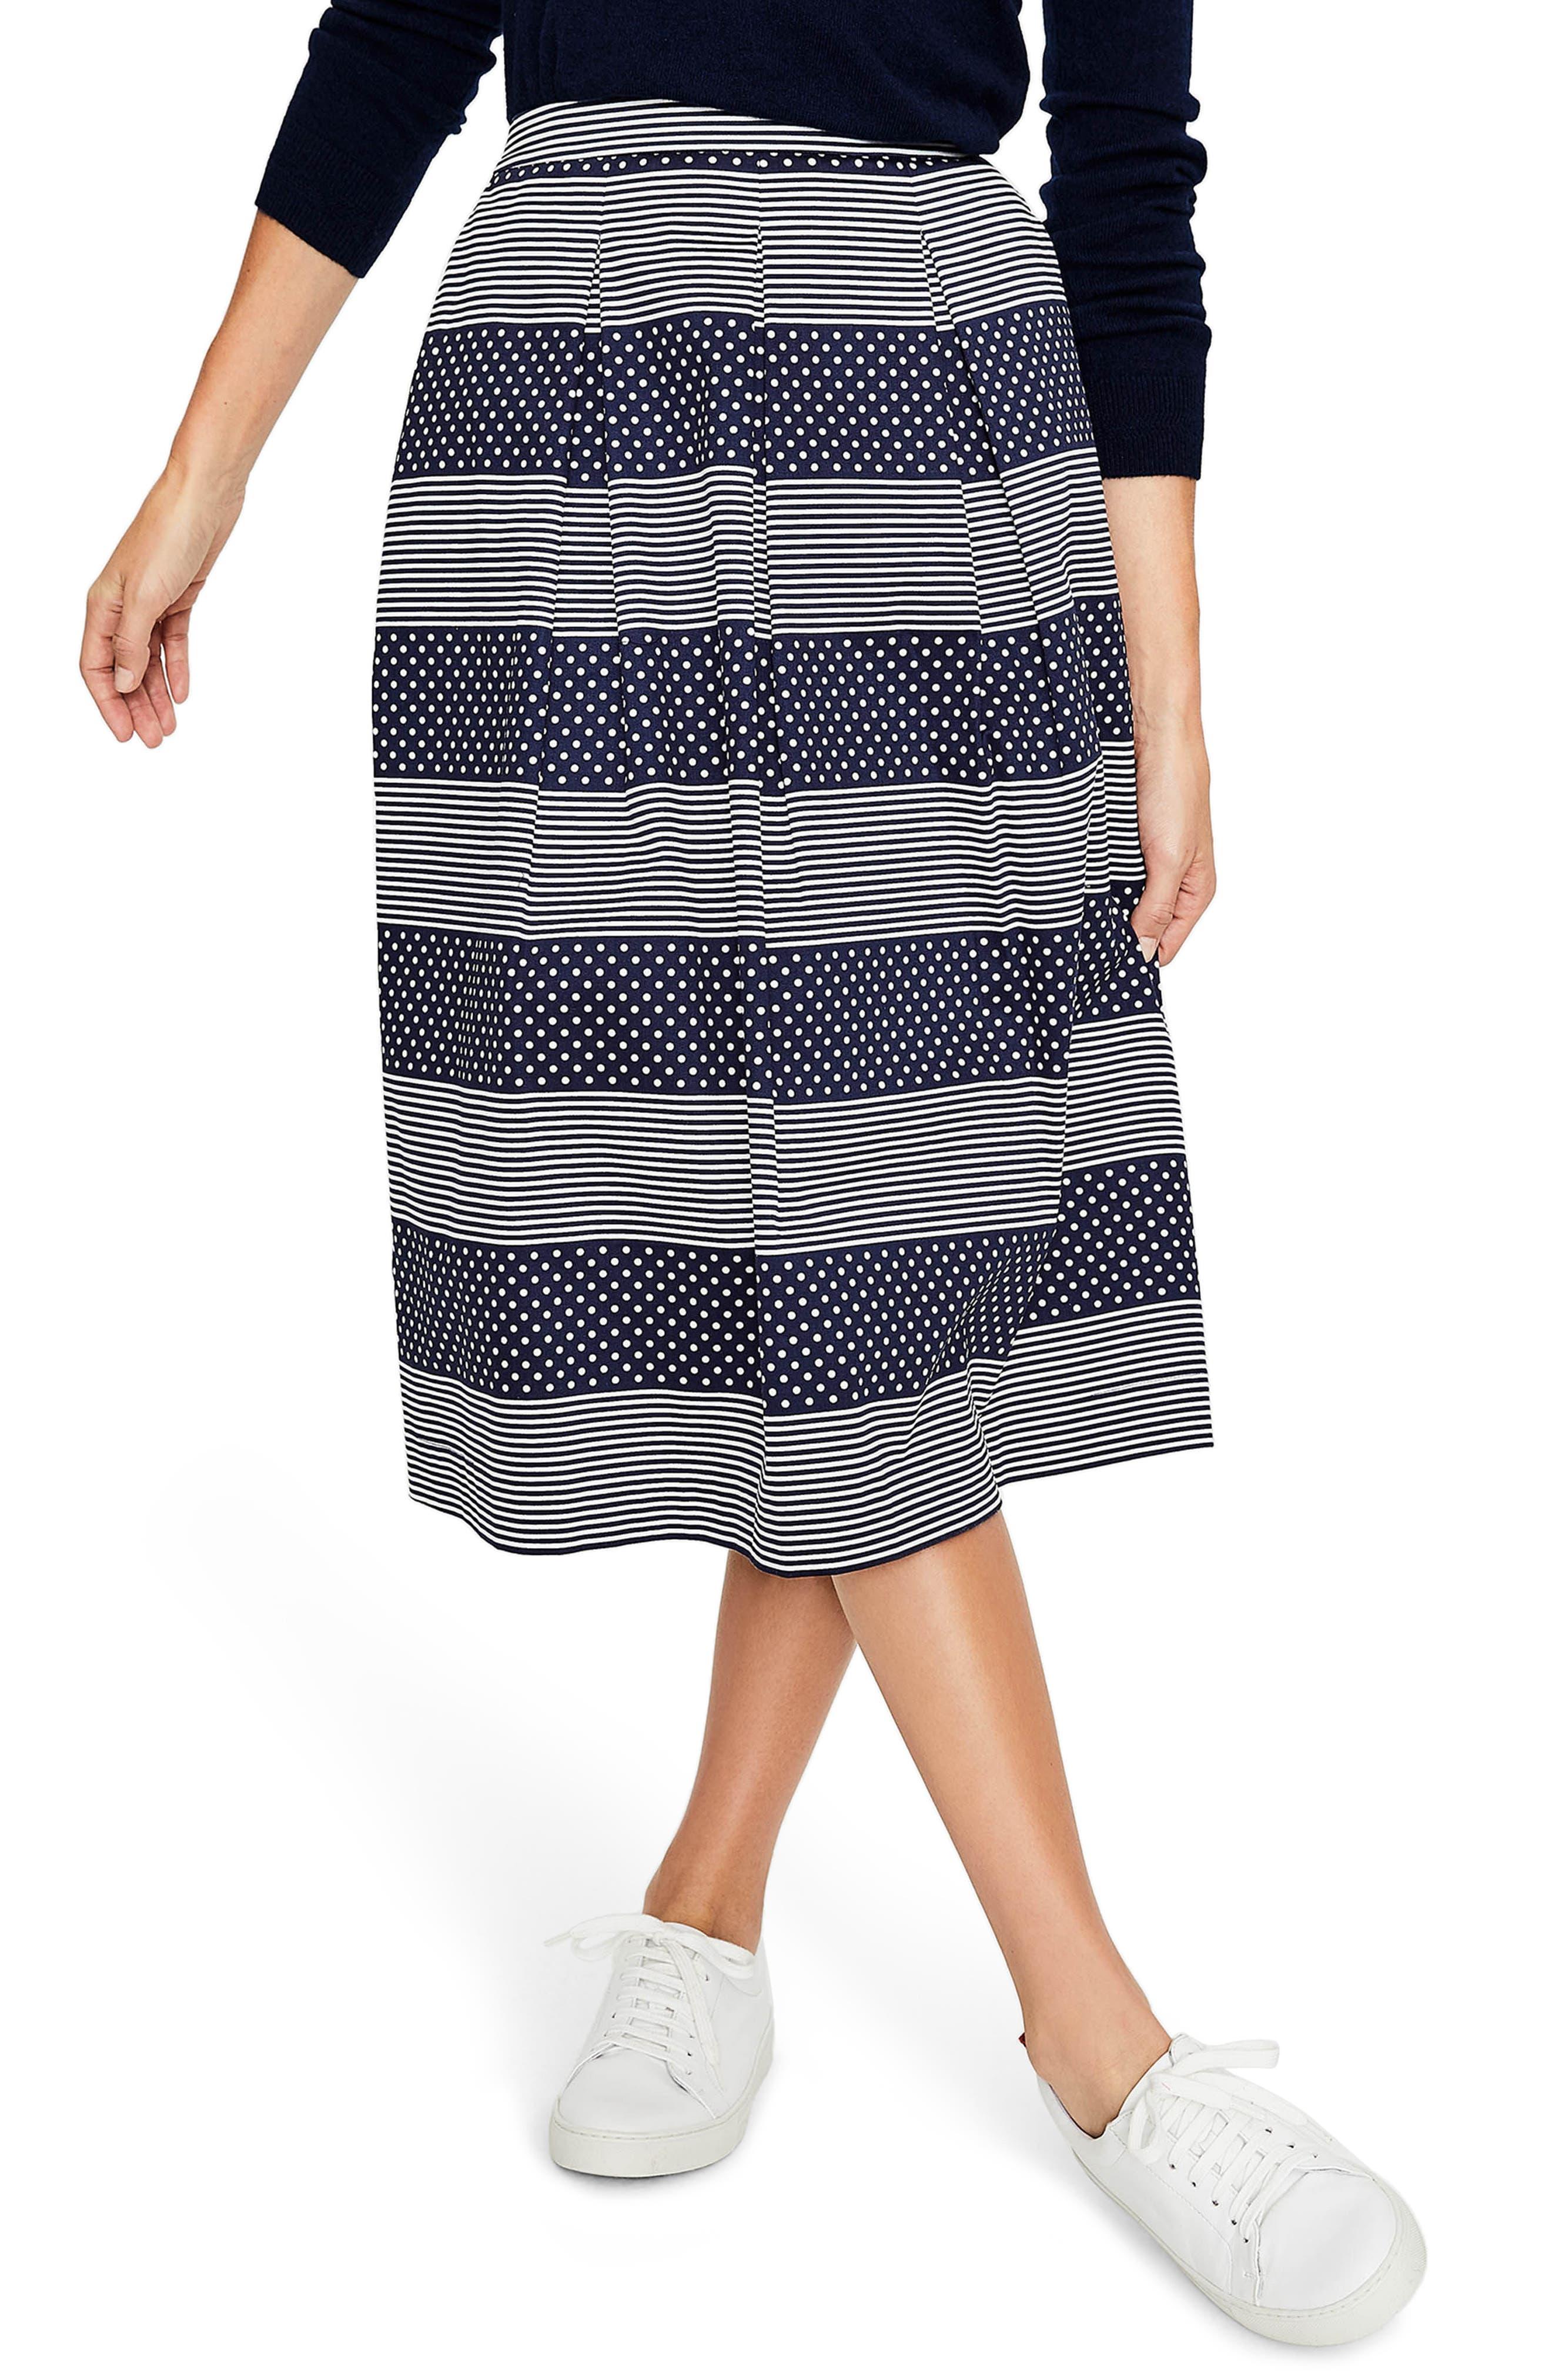 Lola Floral Flared Skirt,                             Main thumbnail 1, color,